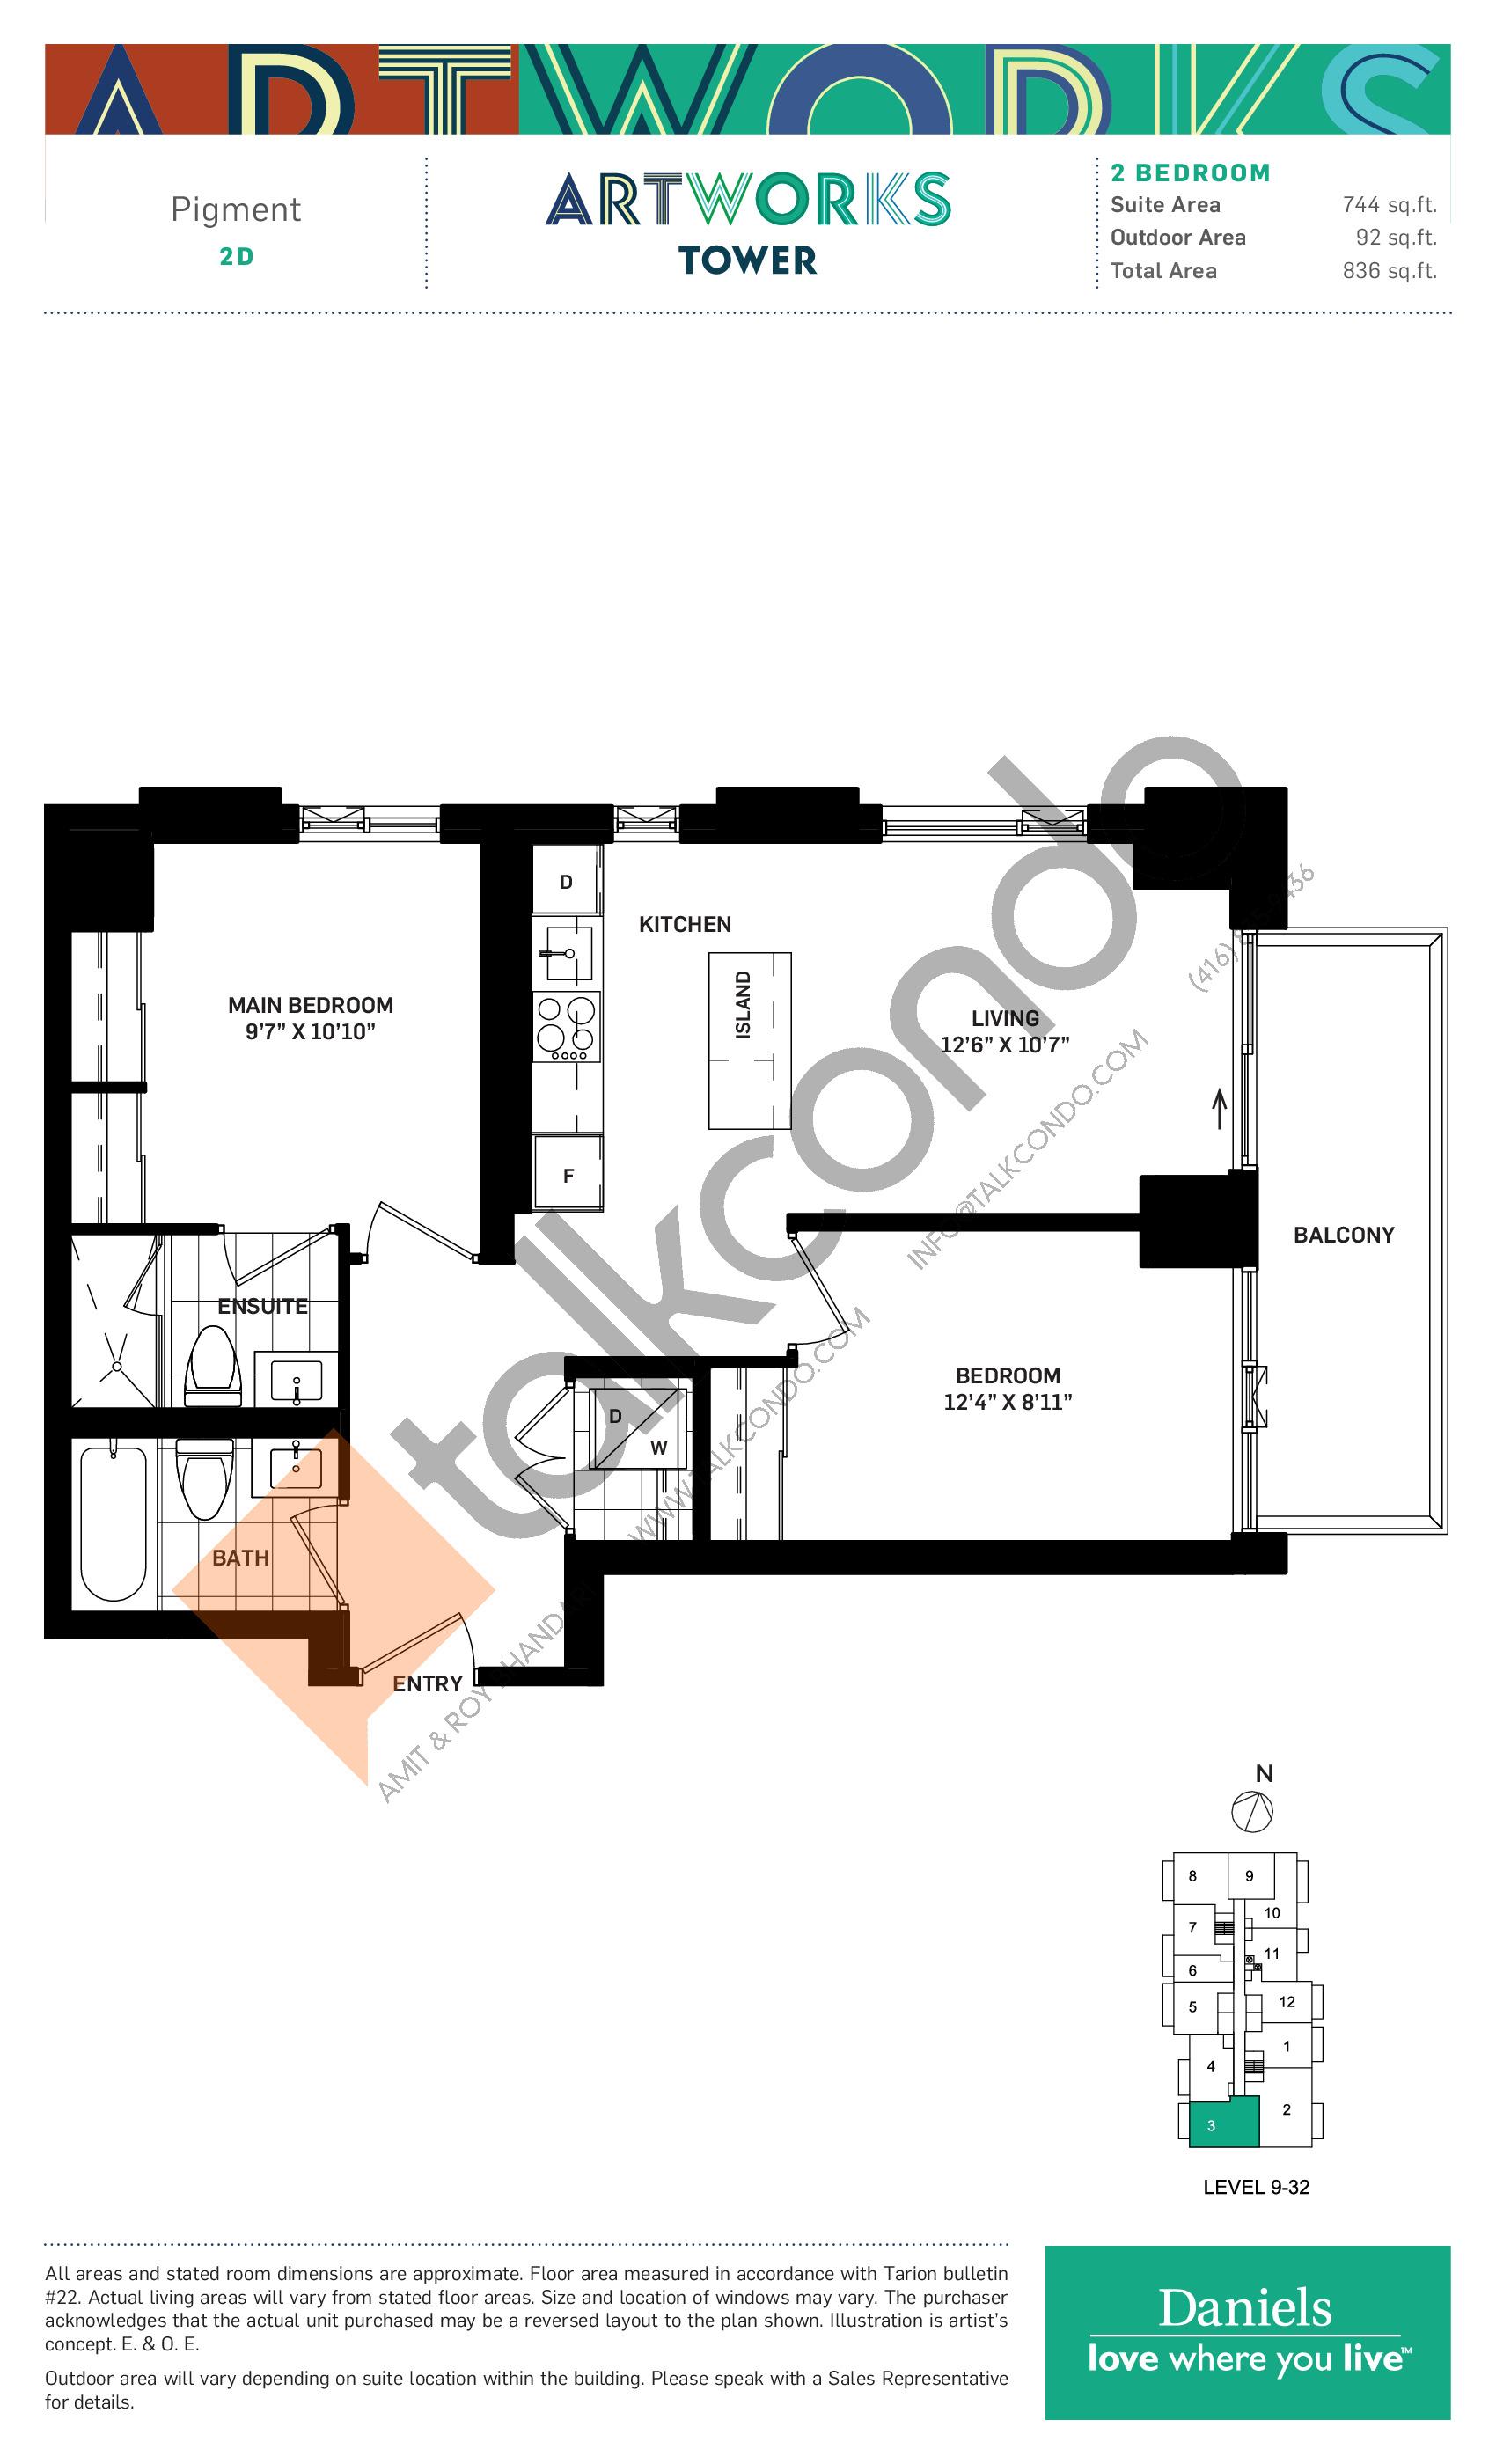 Pigment Floor Plan at Artworks Tower Condos - 744 sq.ft